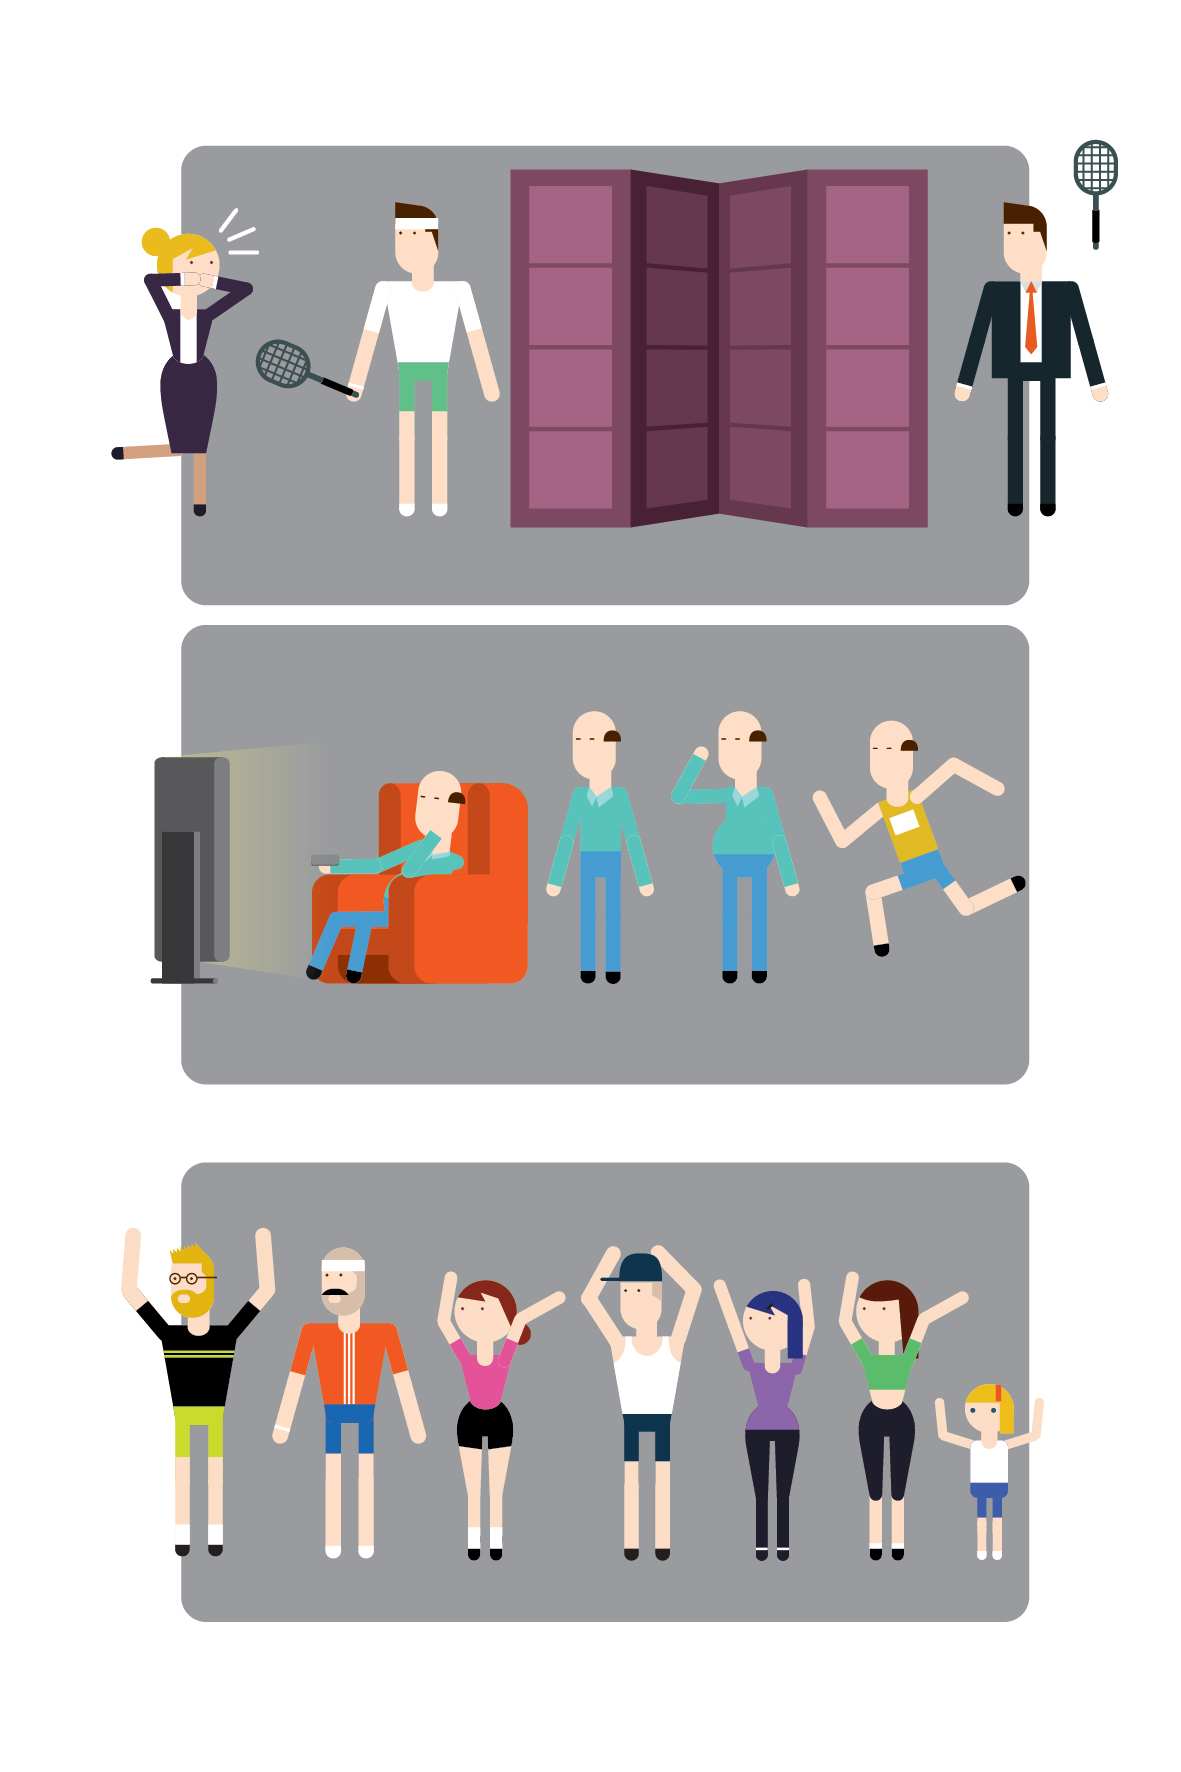 personajes-02.jpg